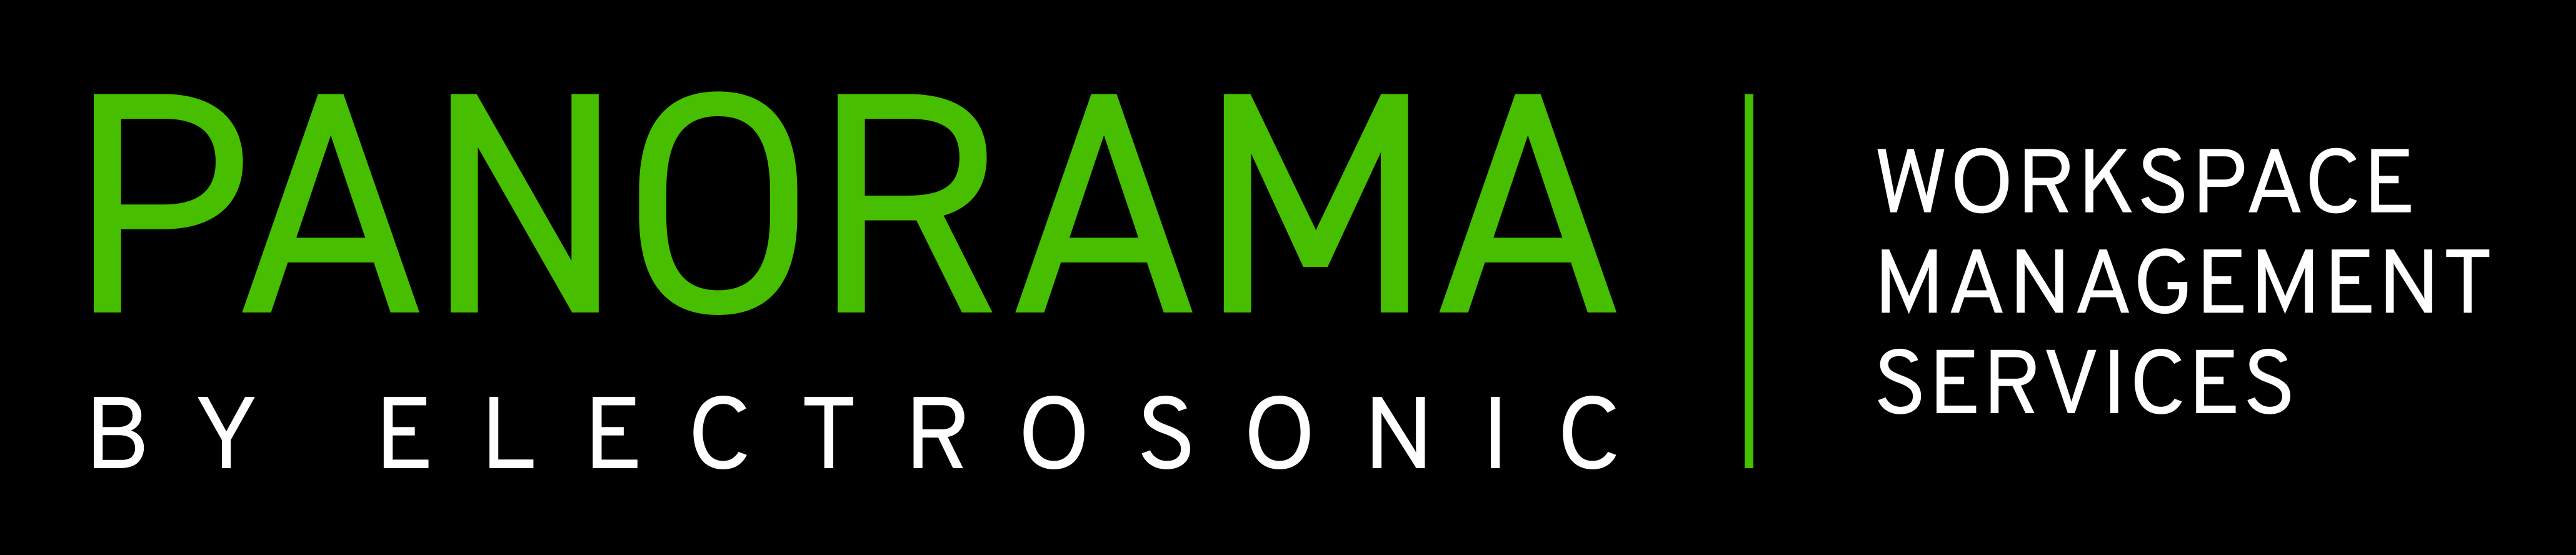 Electrosonic_Panorama_Logo_RGB_Neg